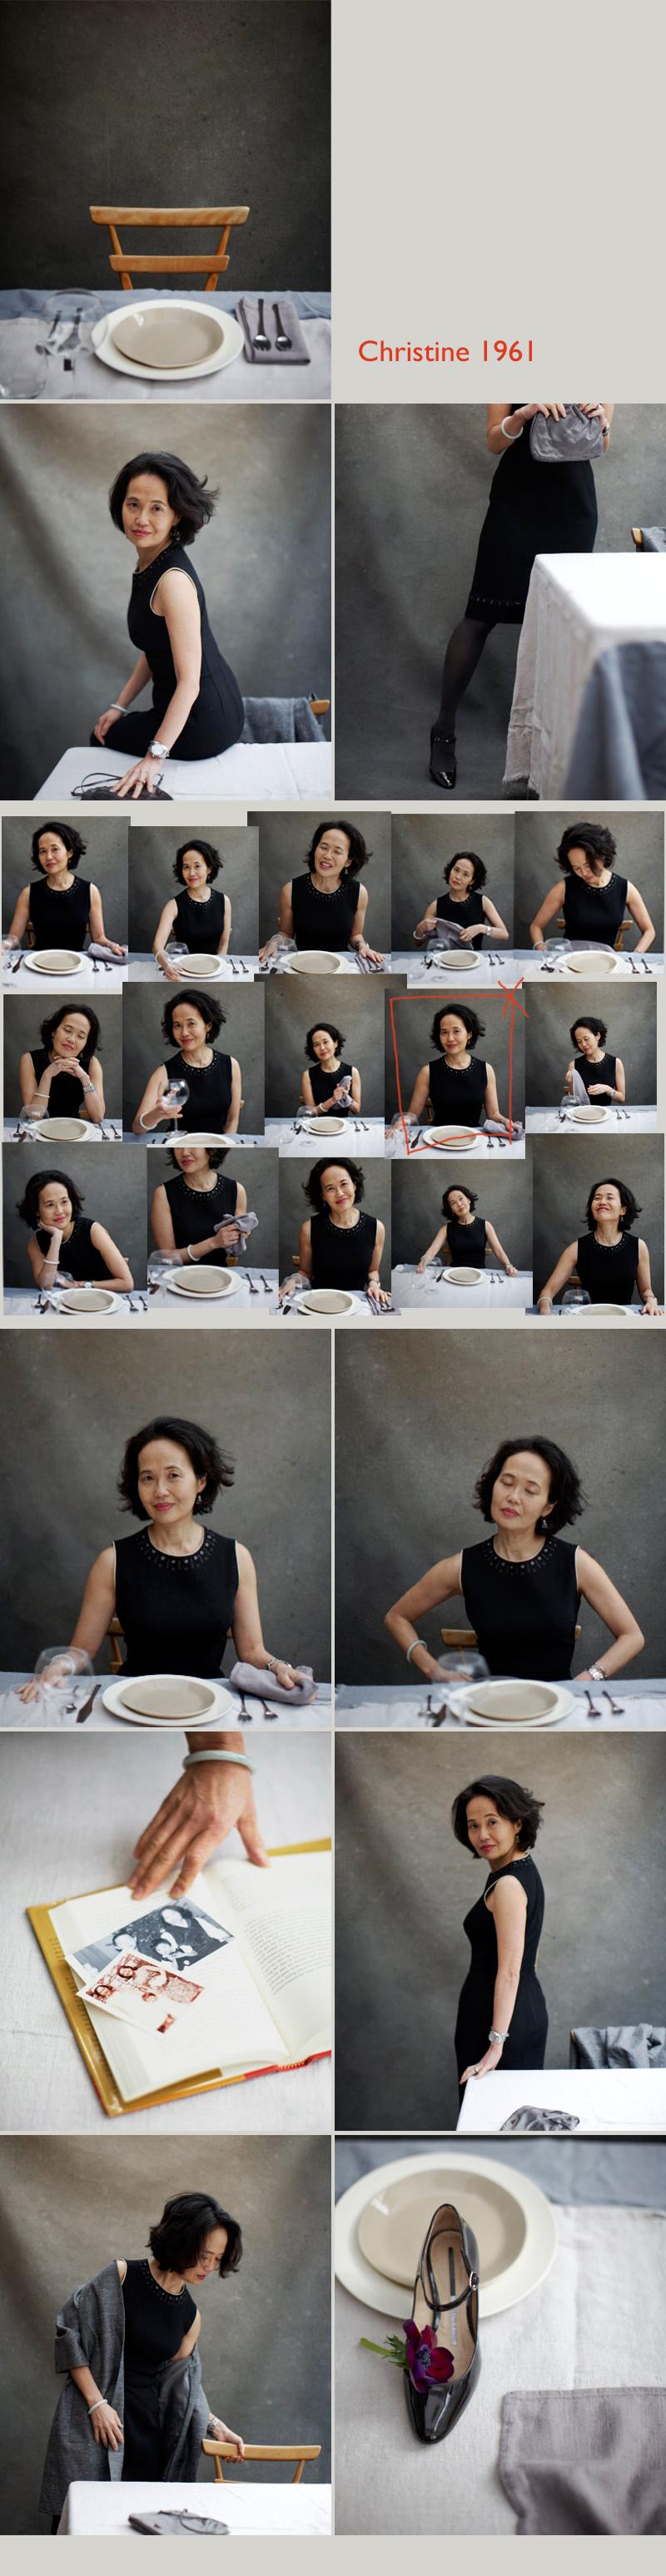 Remodelista, Christine Chang Hanway,  women at 50, Kristin Perers